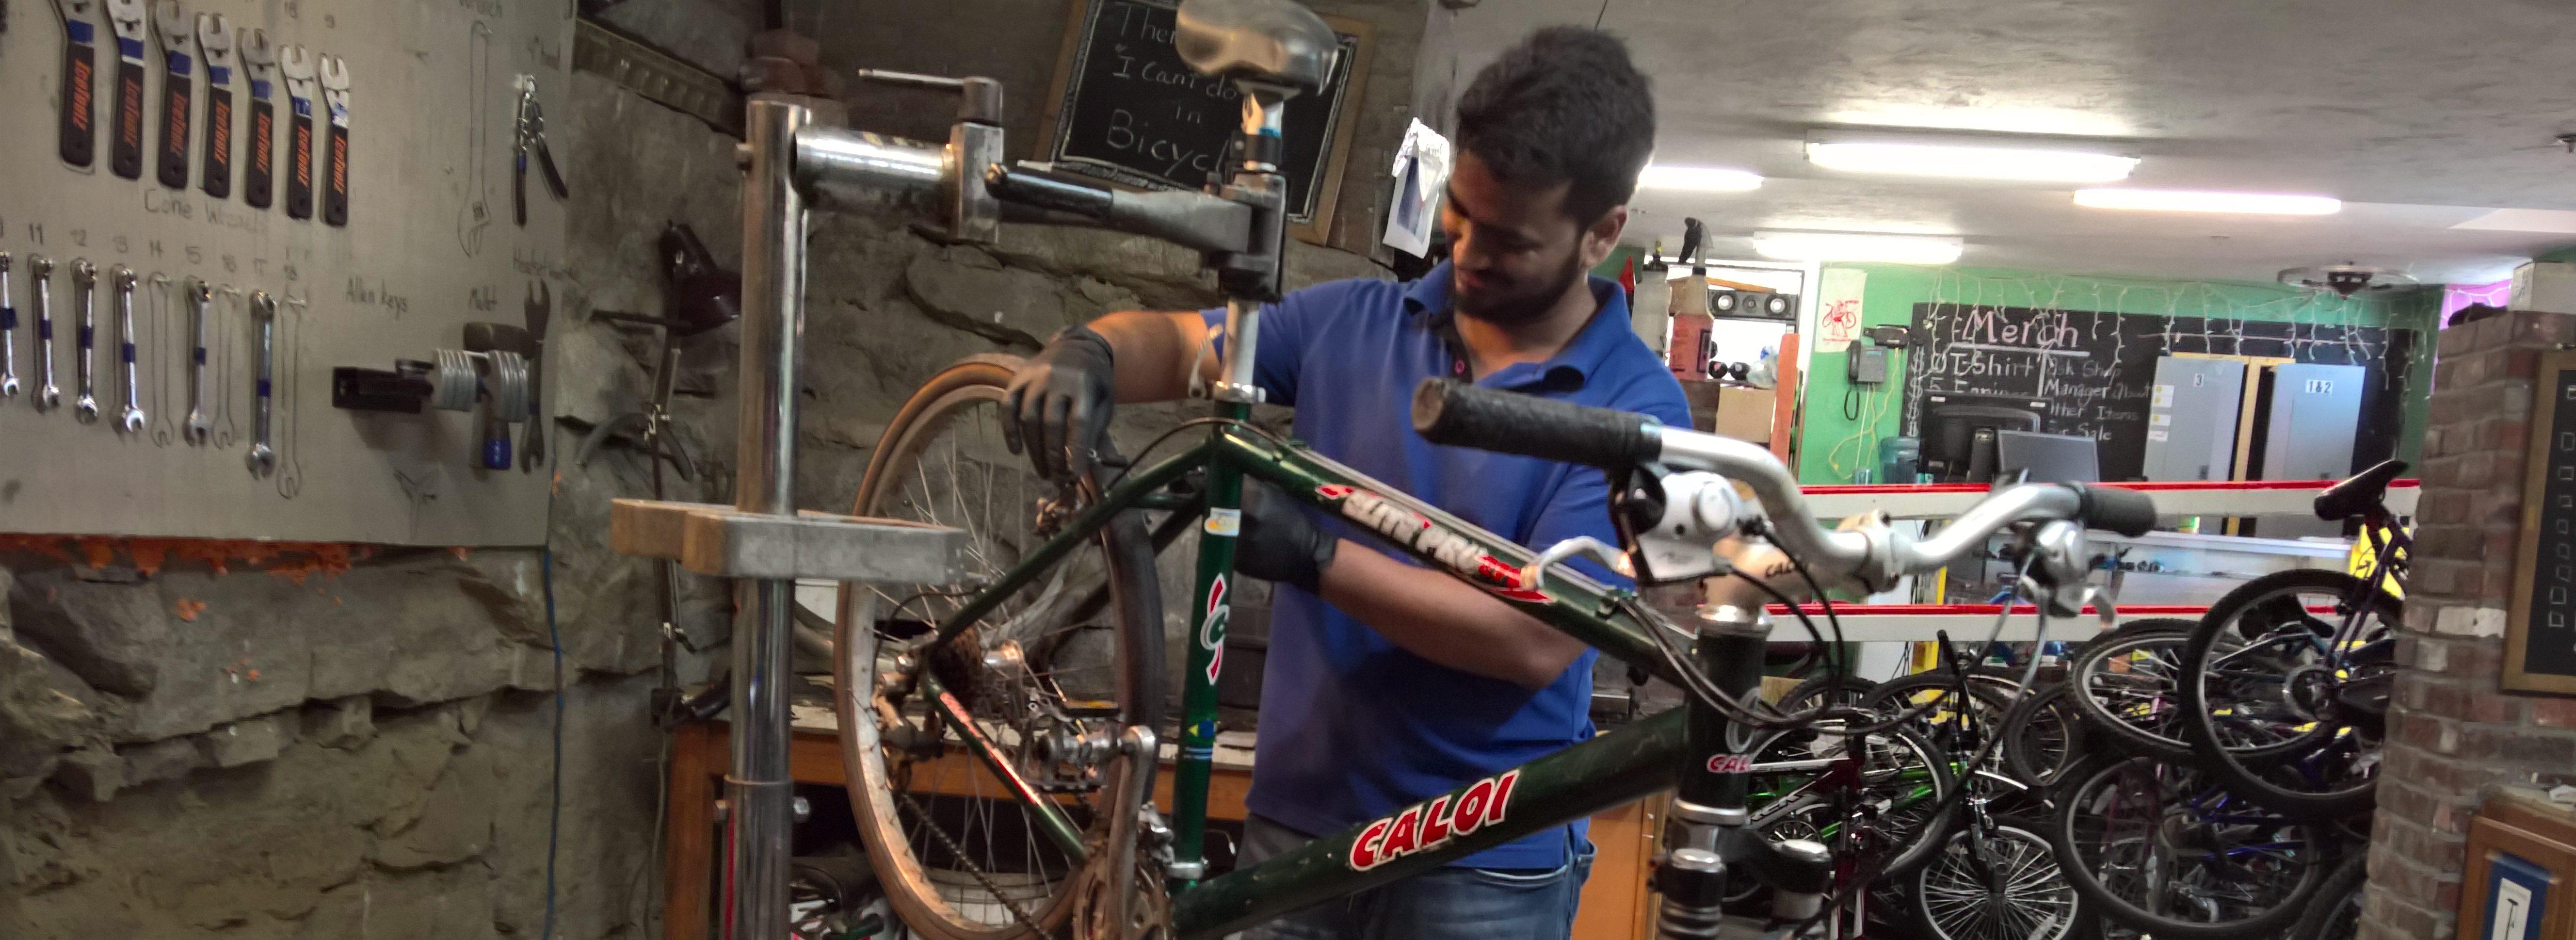 worcester earn-a-bike